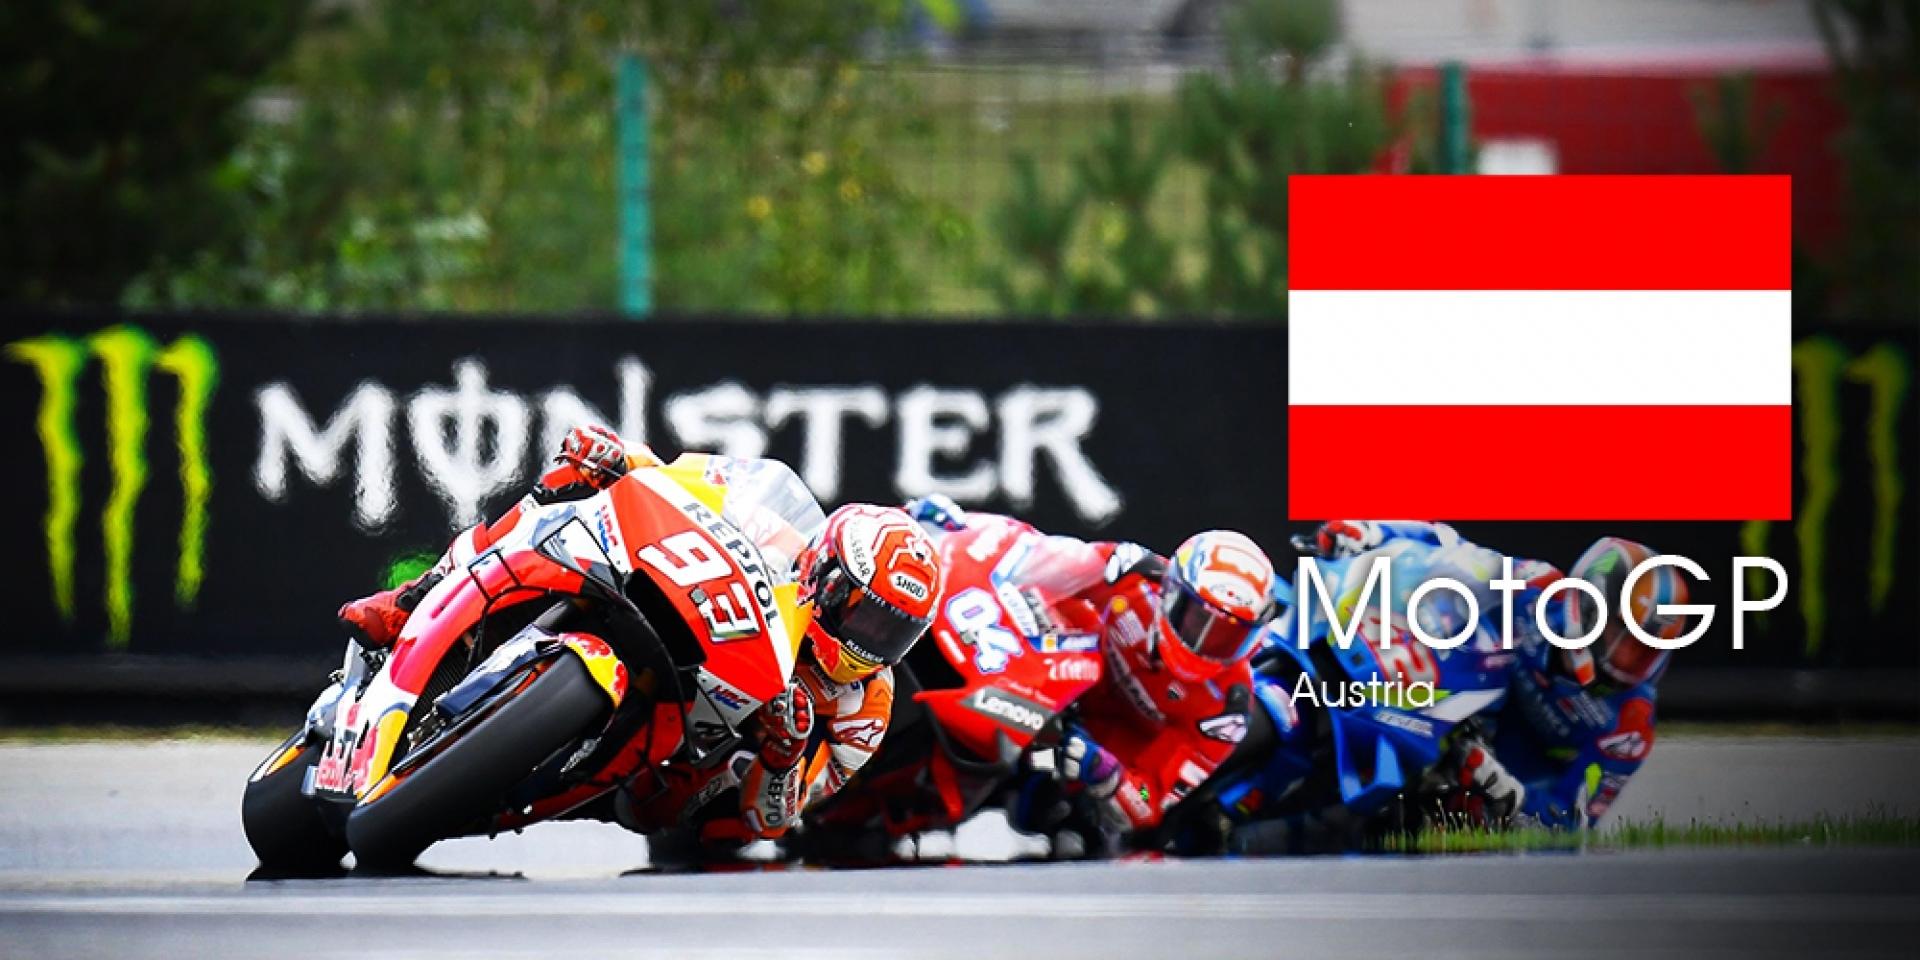 MotoGP 2019 奧地利站 轉播時間